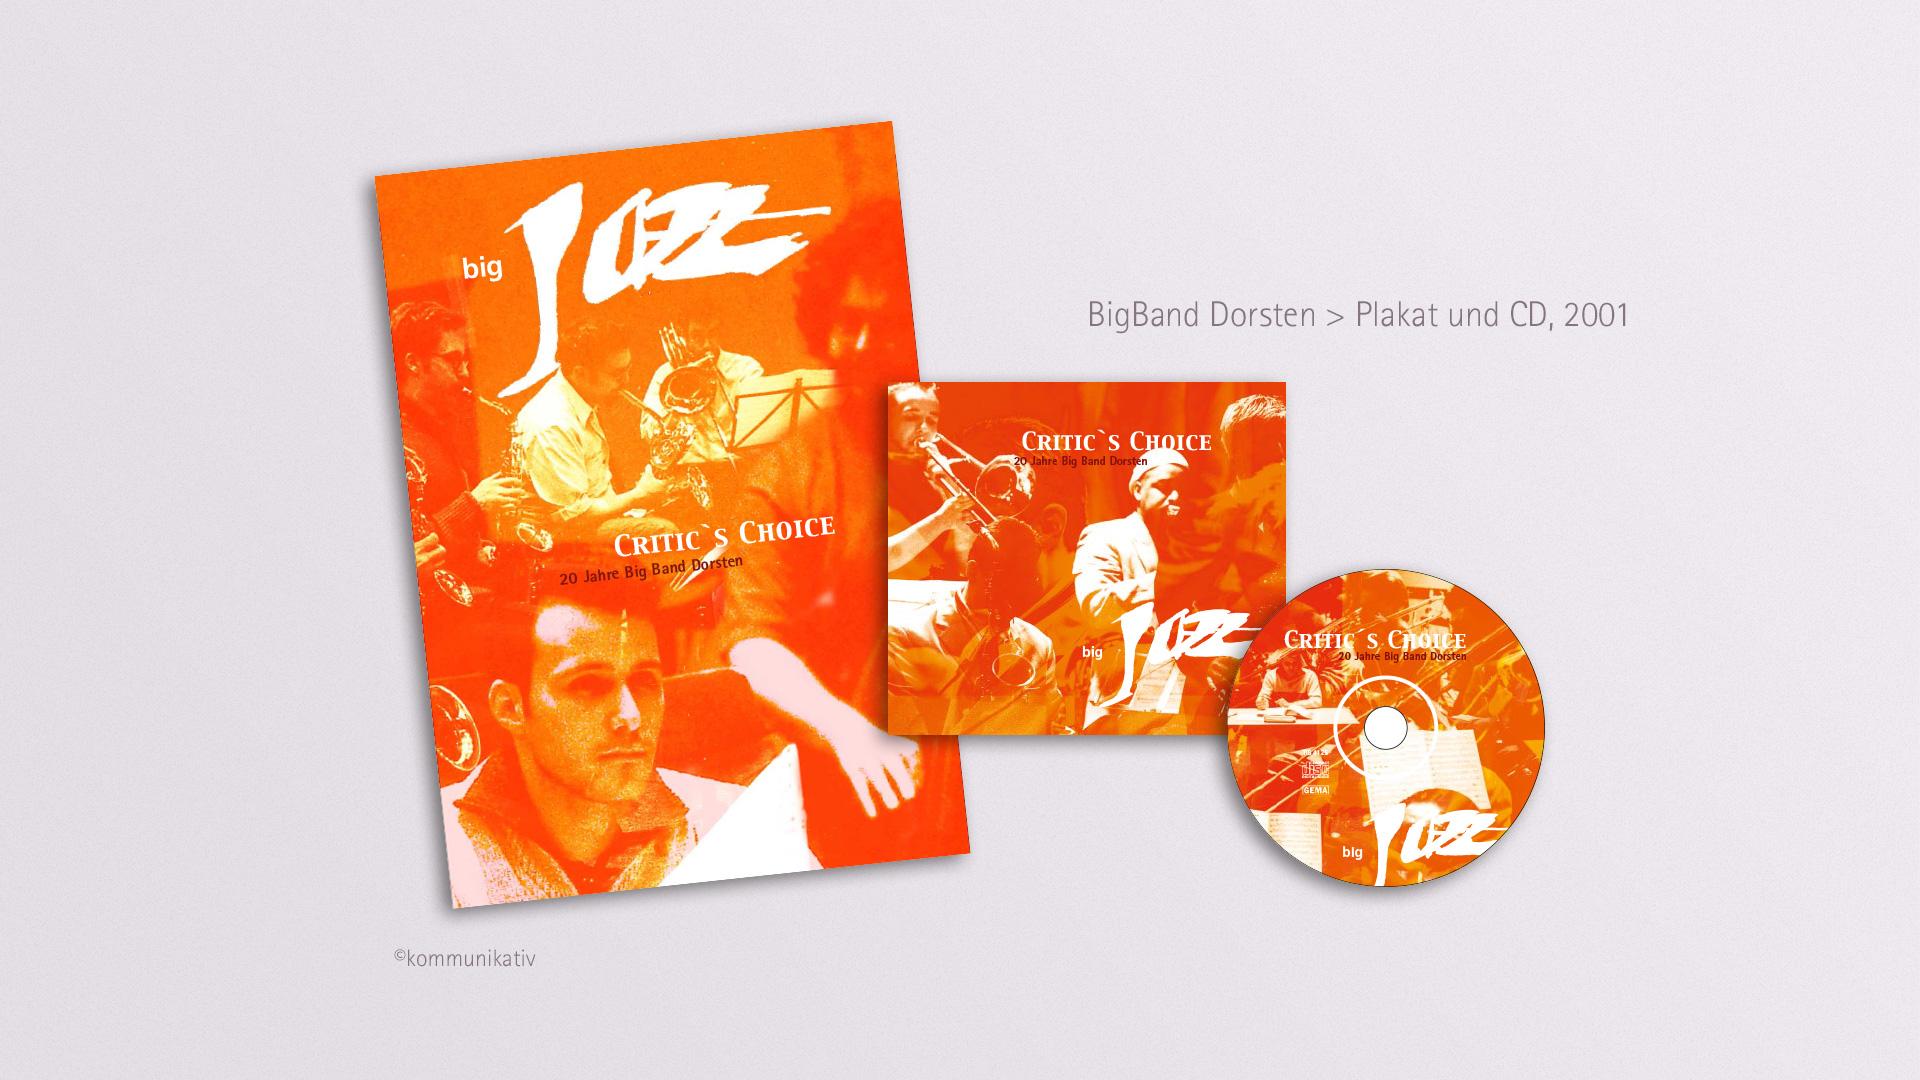 BigBand Dorsten CD 2001